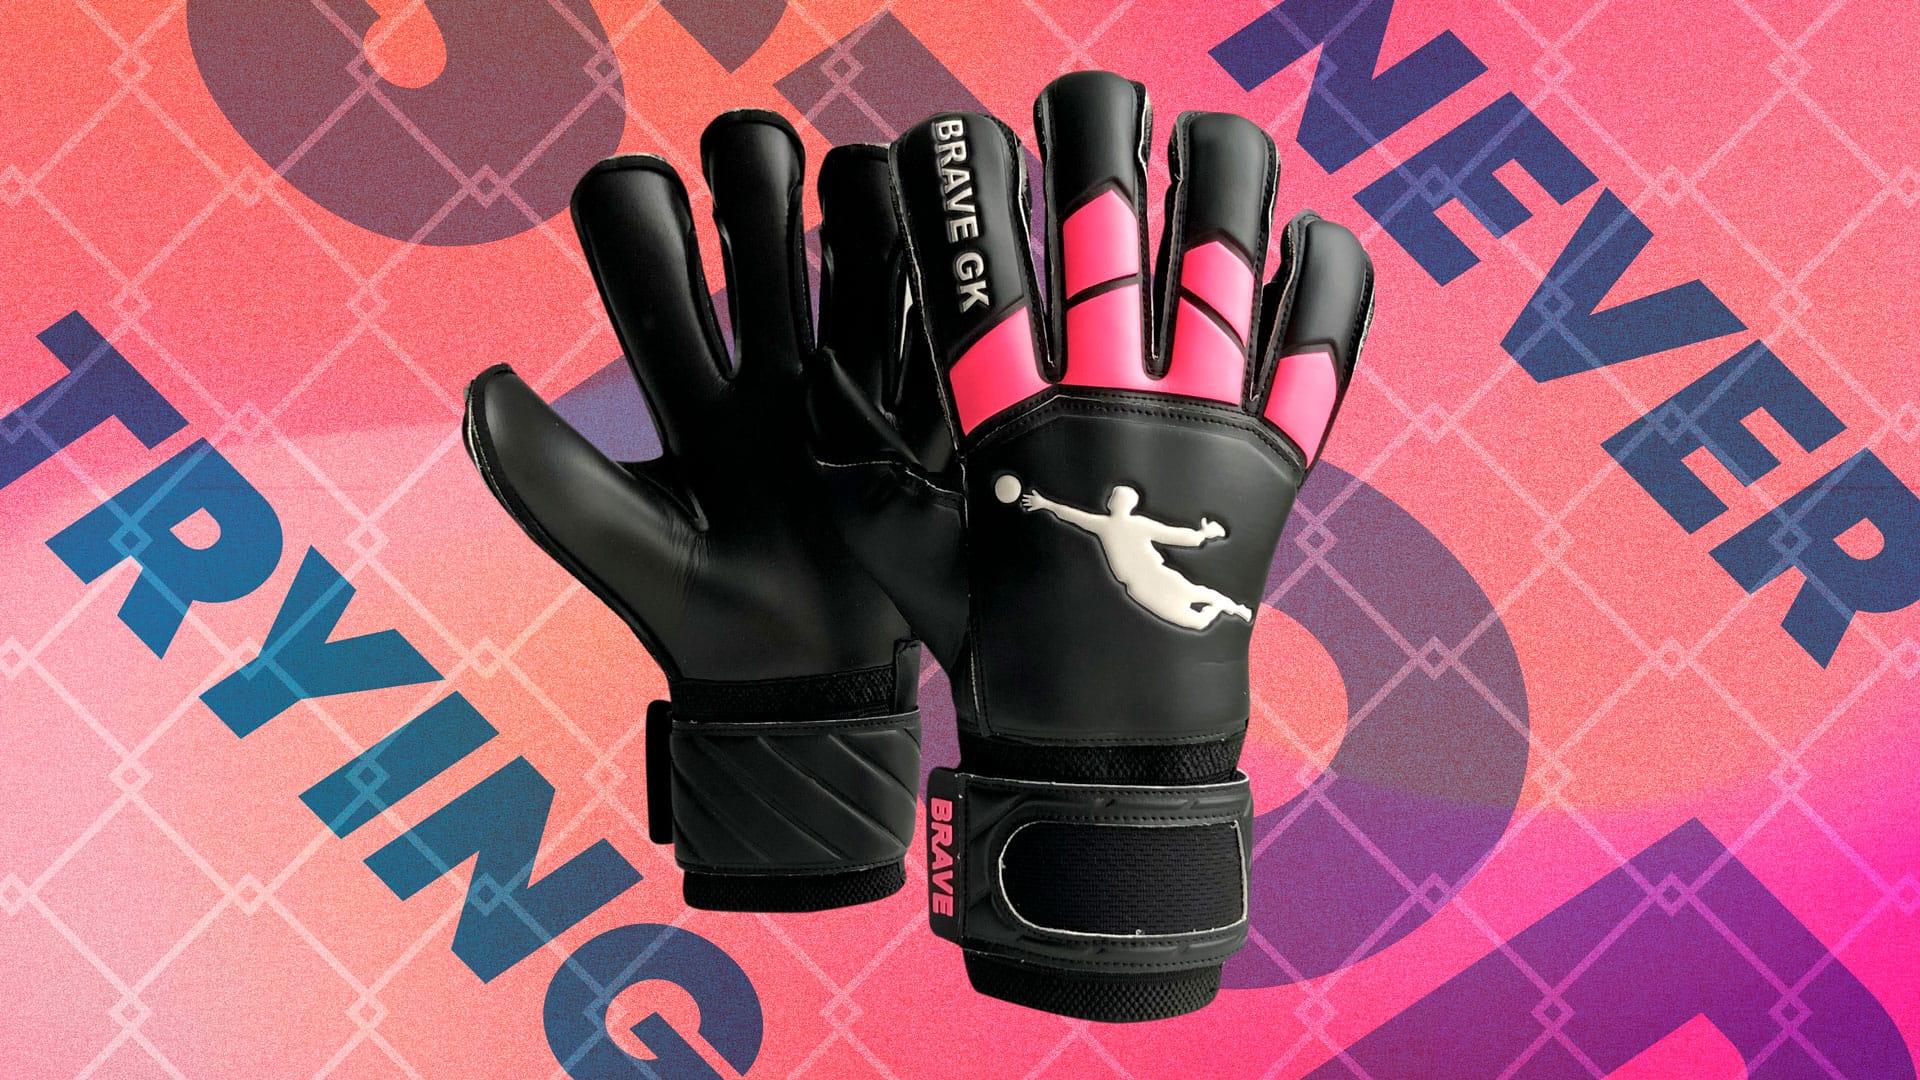 Перчатки Brave GK Phantome Pink - официальный интернет-магазин Brave GK